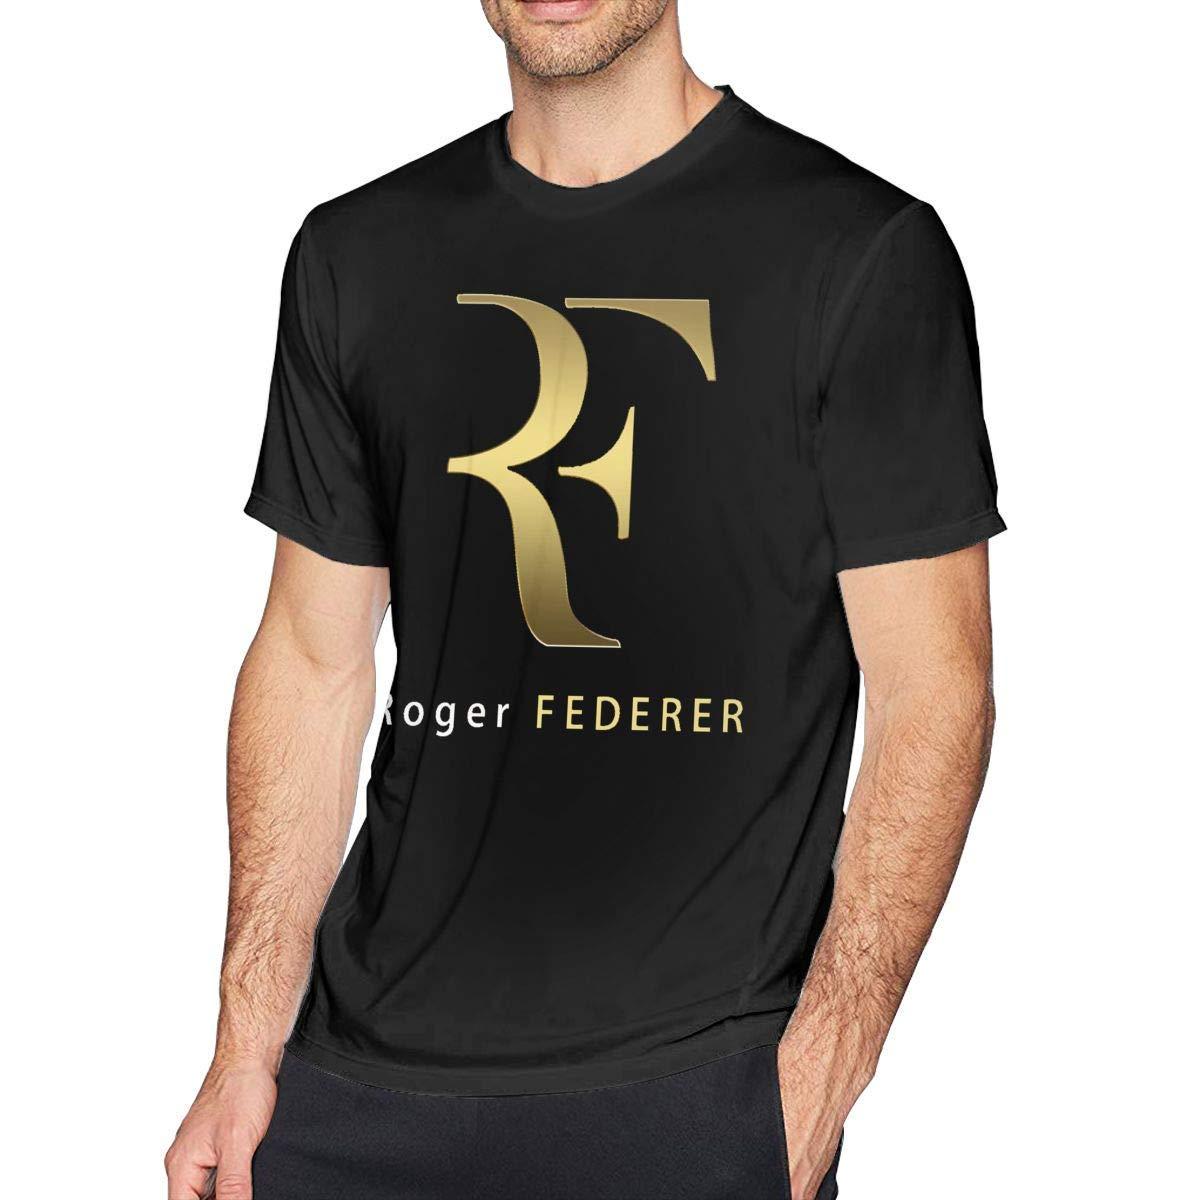 Pillowcase Wholesale Roger-Federer Camiseta Clásica Hombre Negro ...